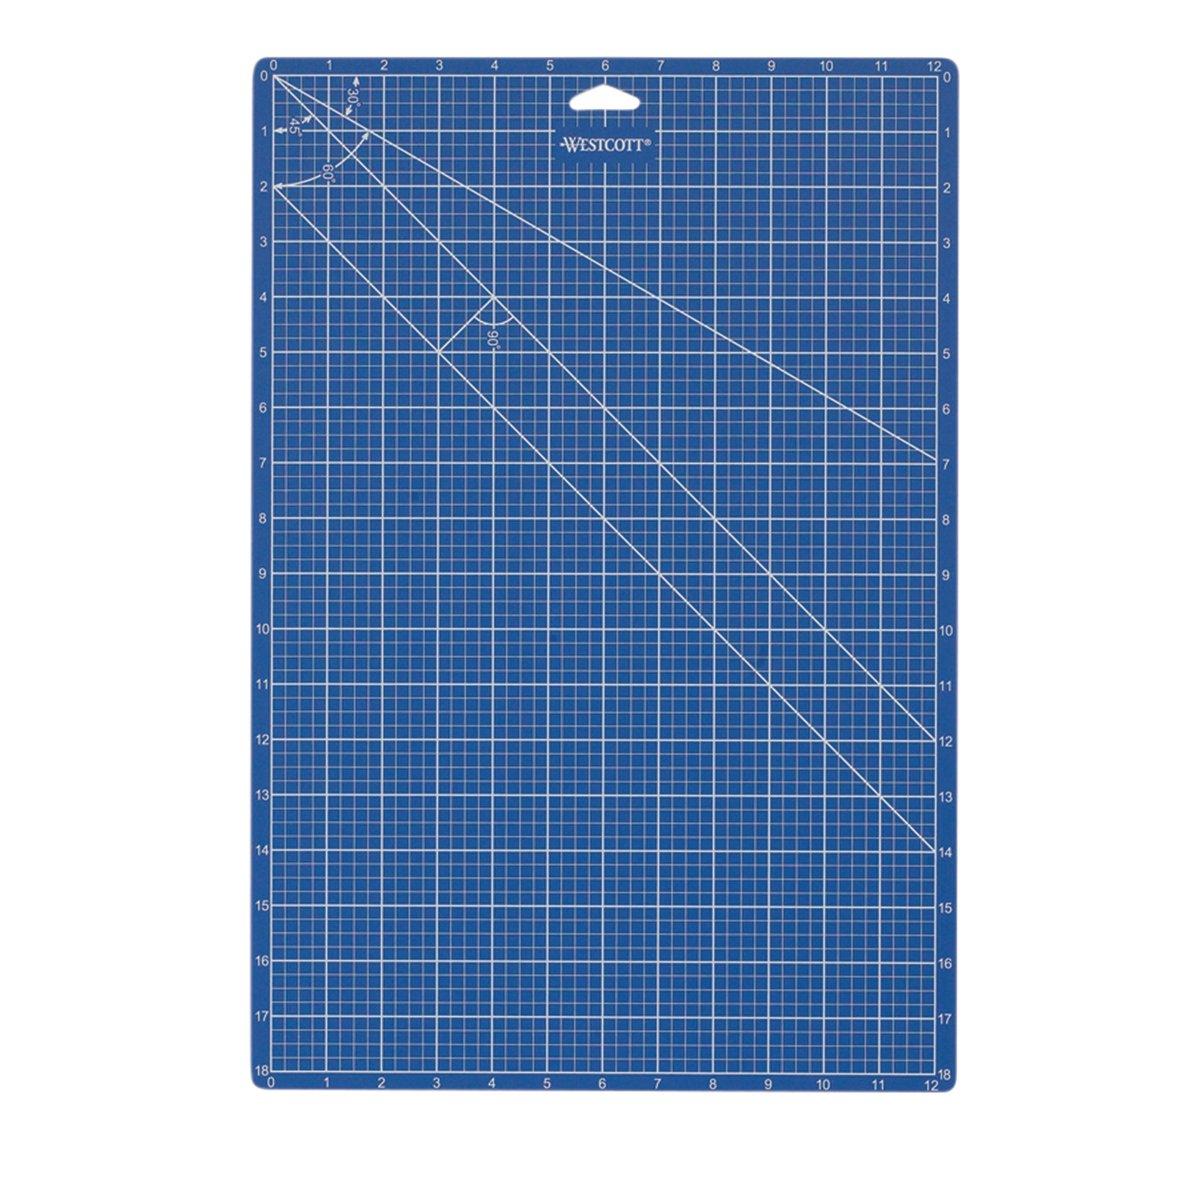 Westcott 18-Inch x 24-Inch Self-Healing Cutting Mat, Blue (18243) Acme Office Products